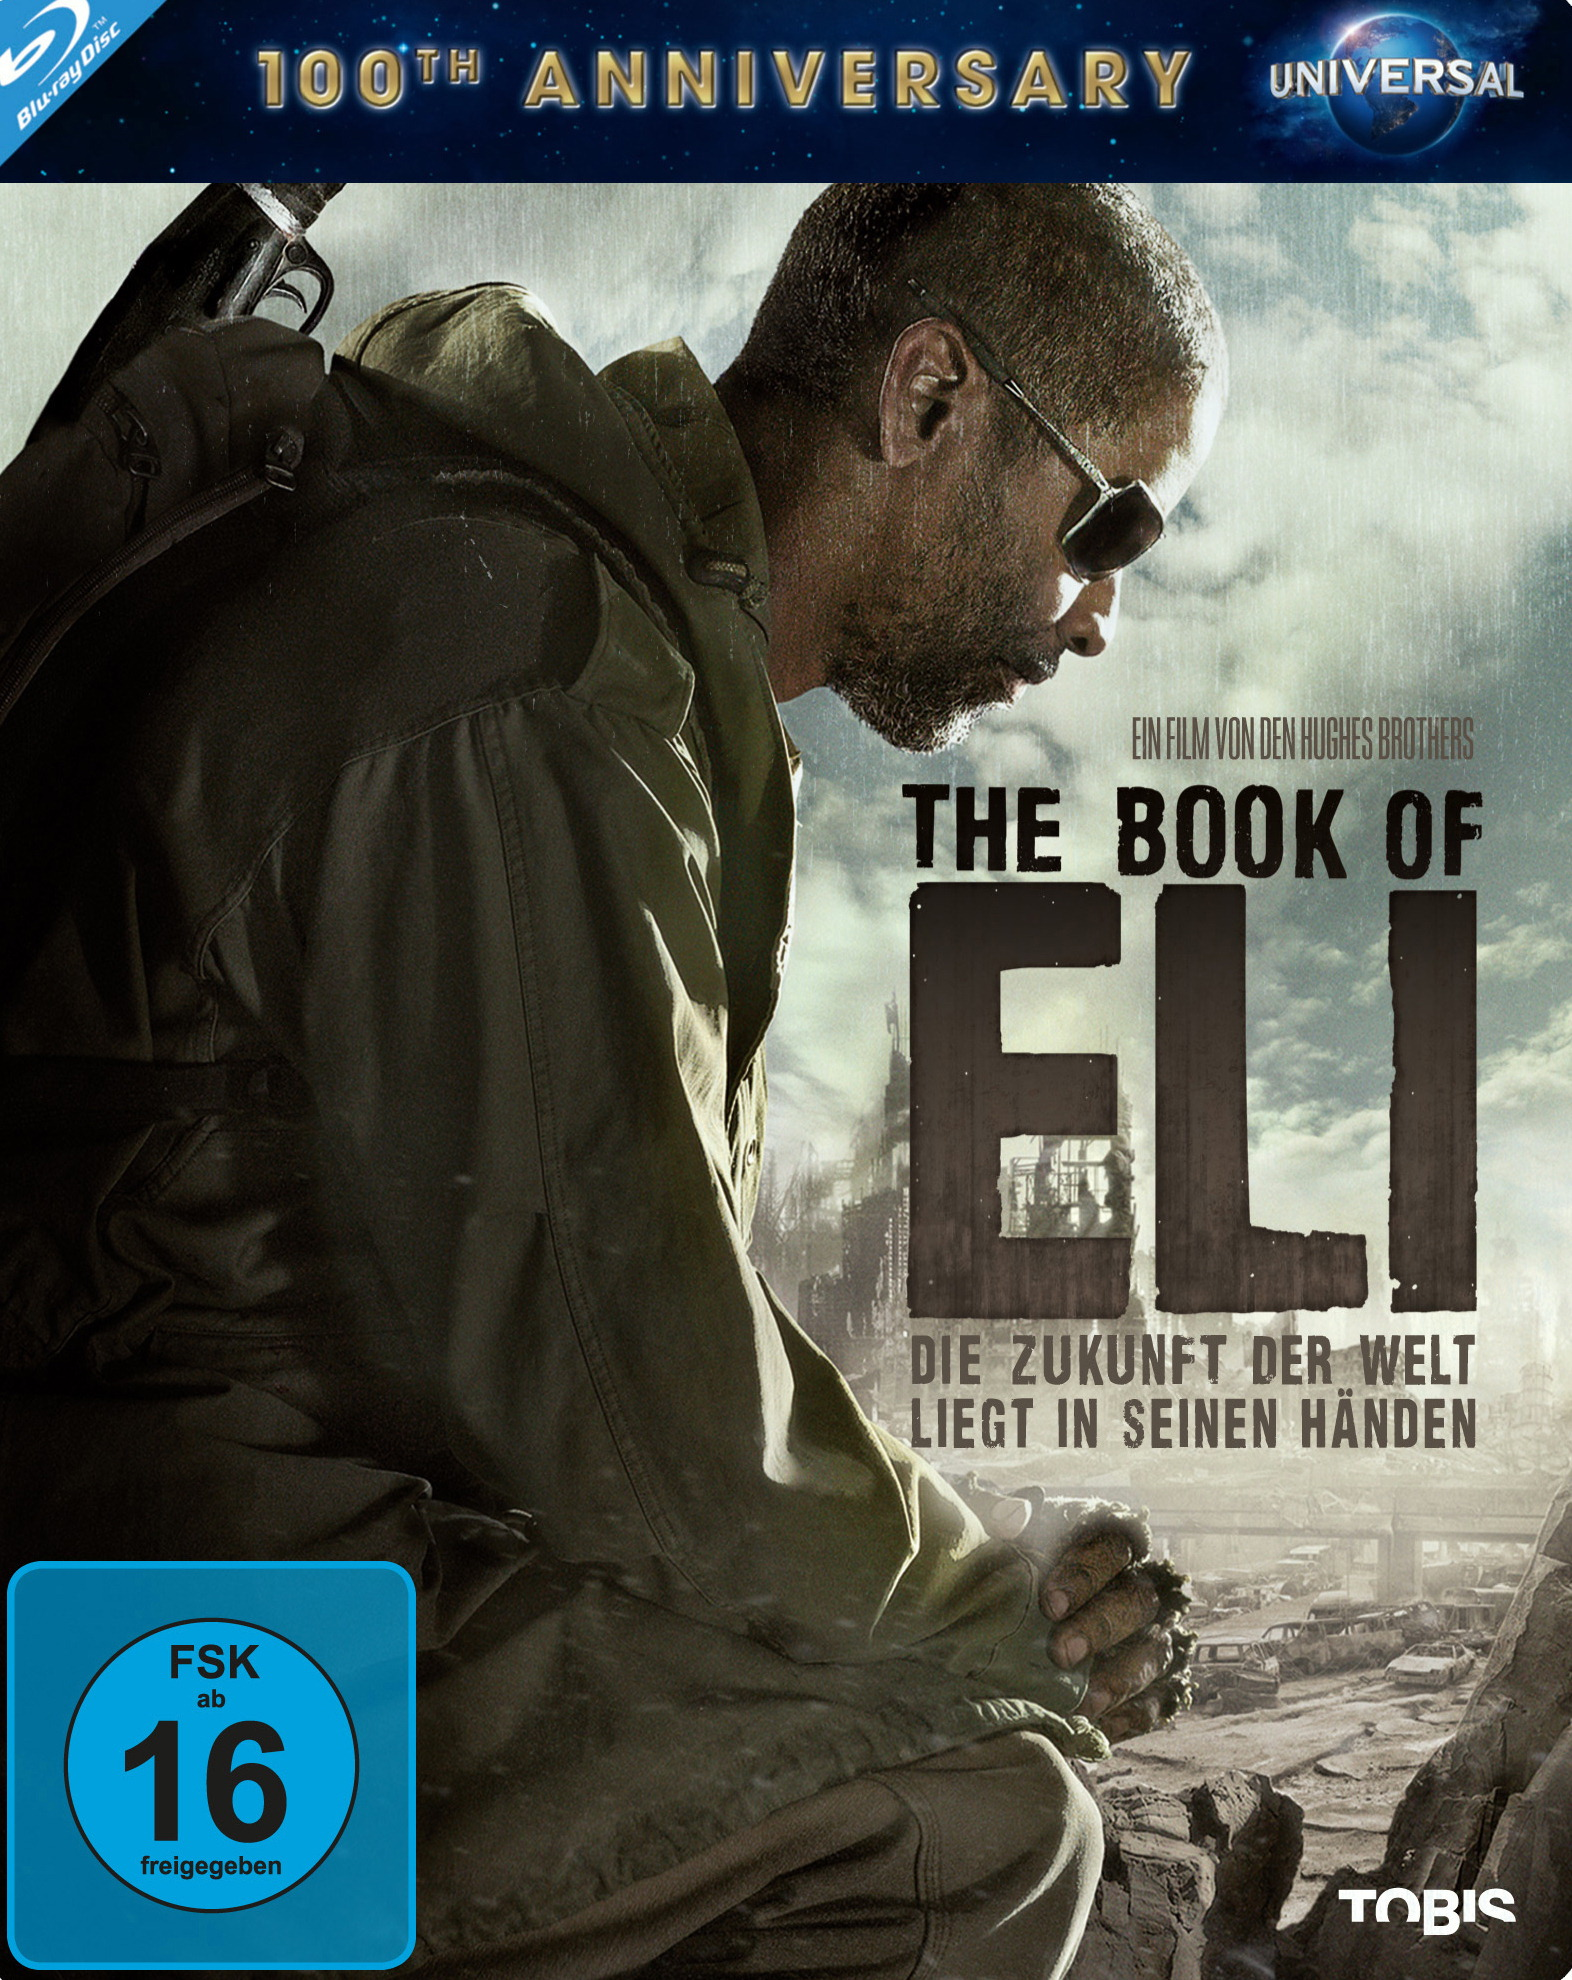 The Book of Eli (Steelbook) Poster